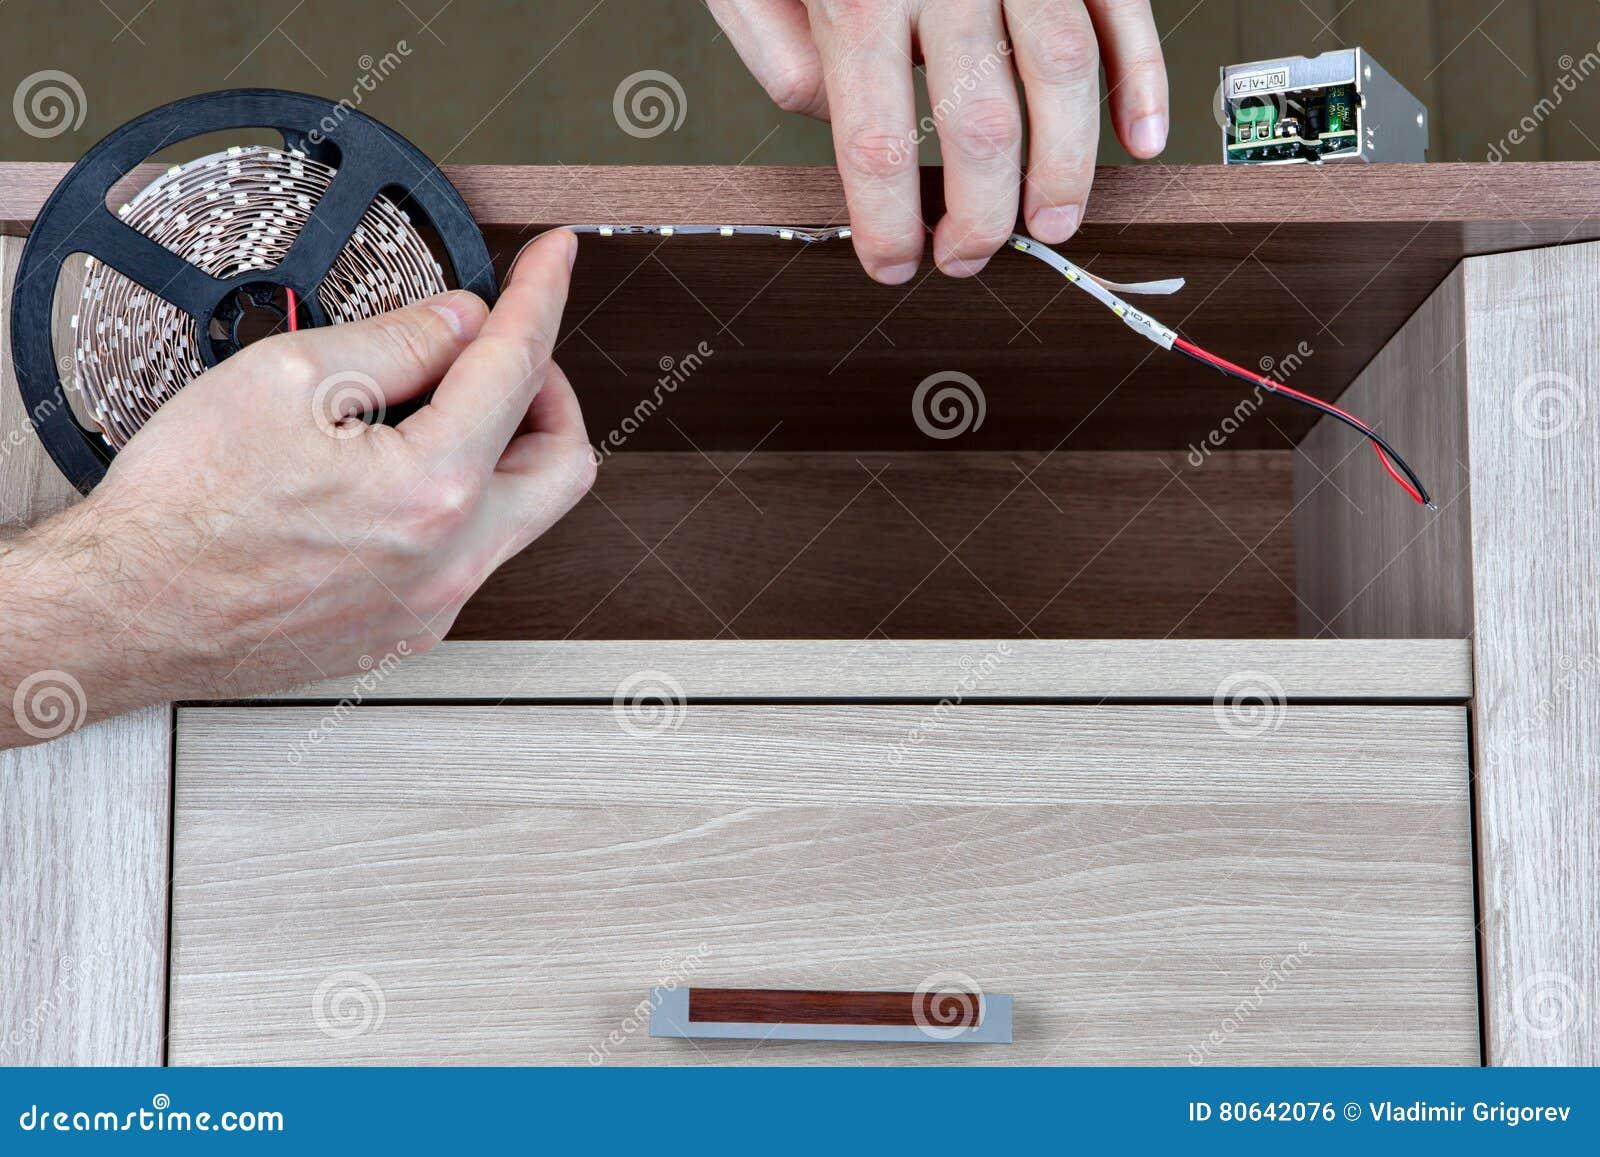 Installing LED Lighting Inside Furniture Cabinet, Hands Man Close Up. Stock Photo